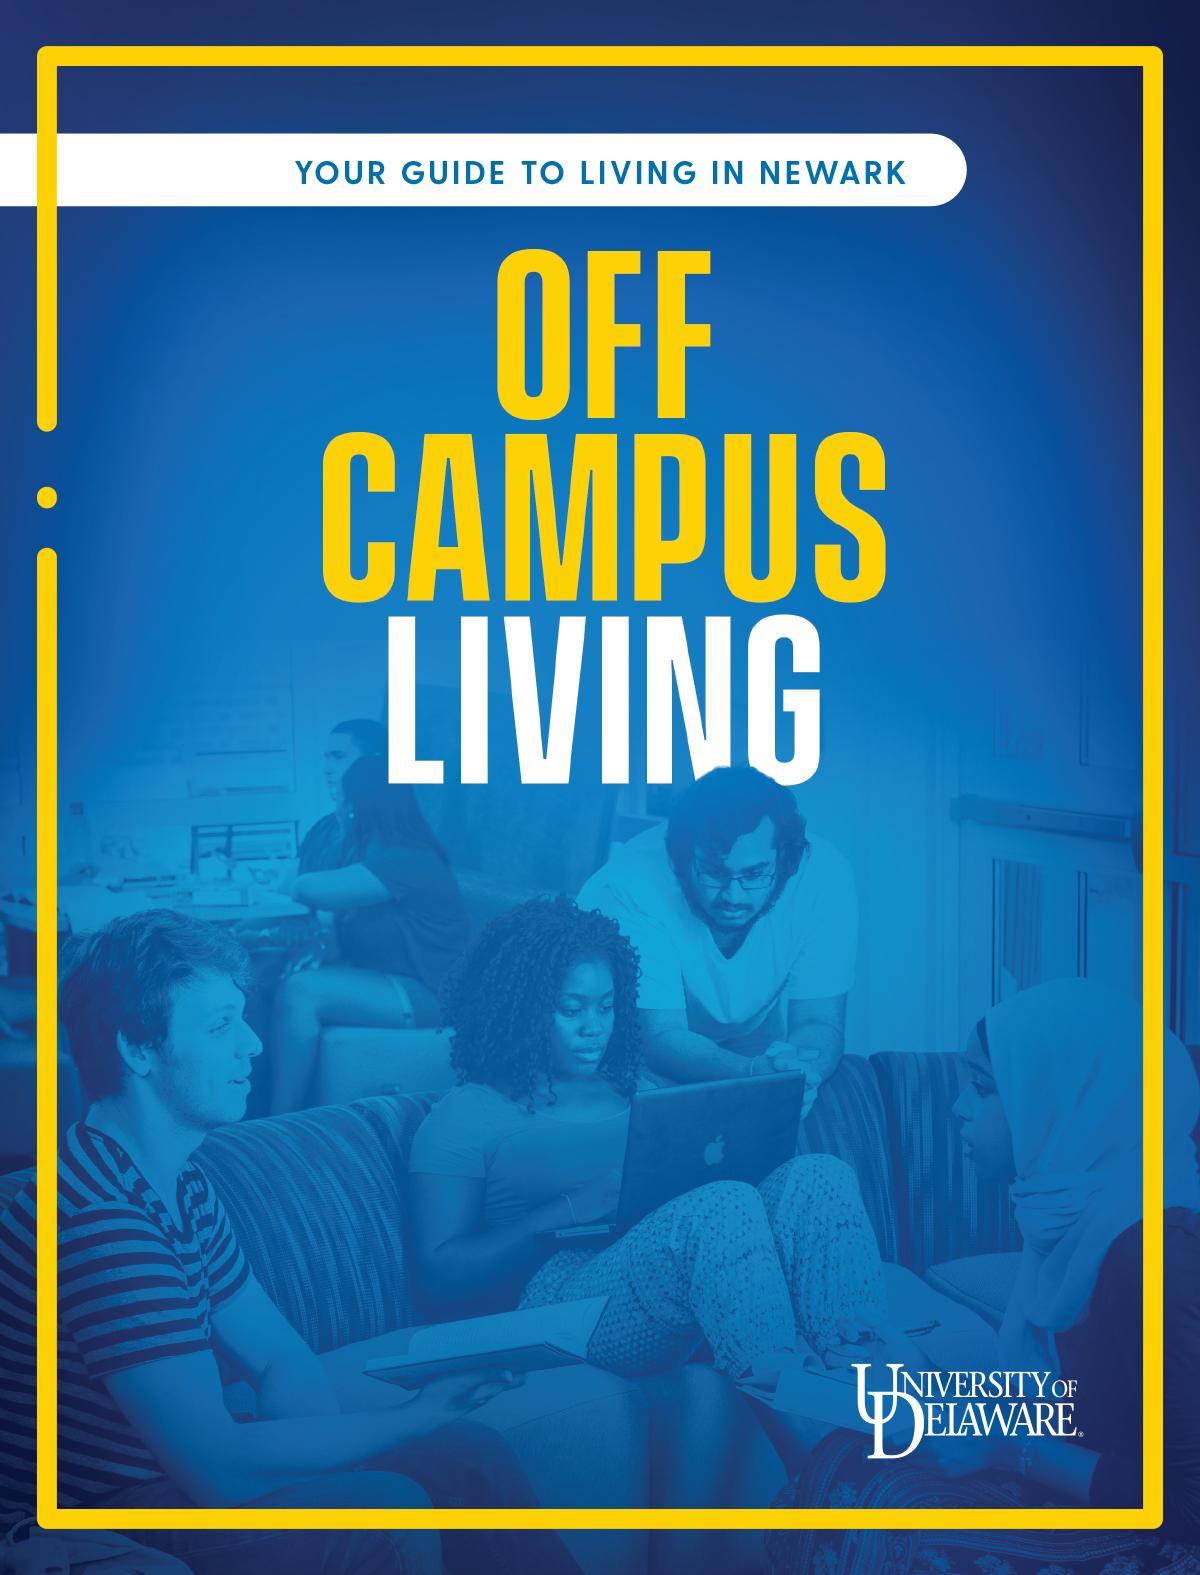 Off Campus Guide